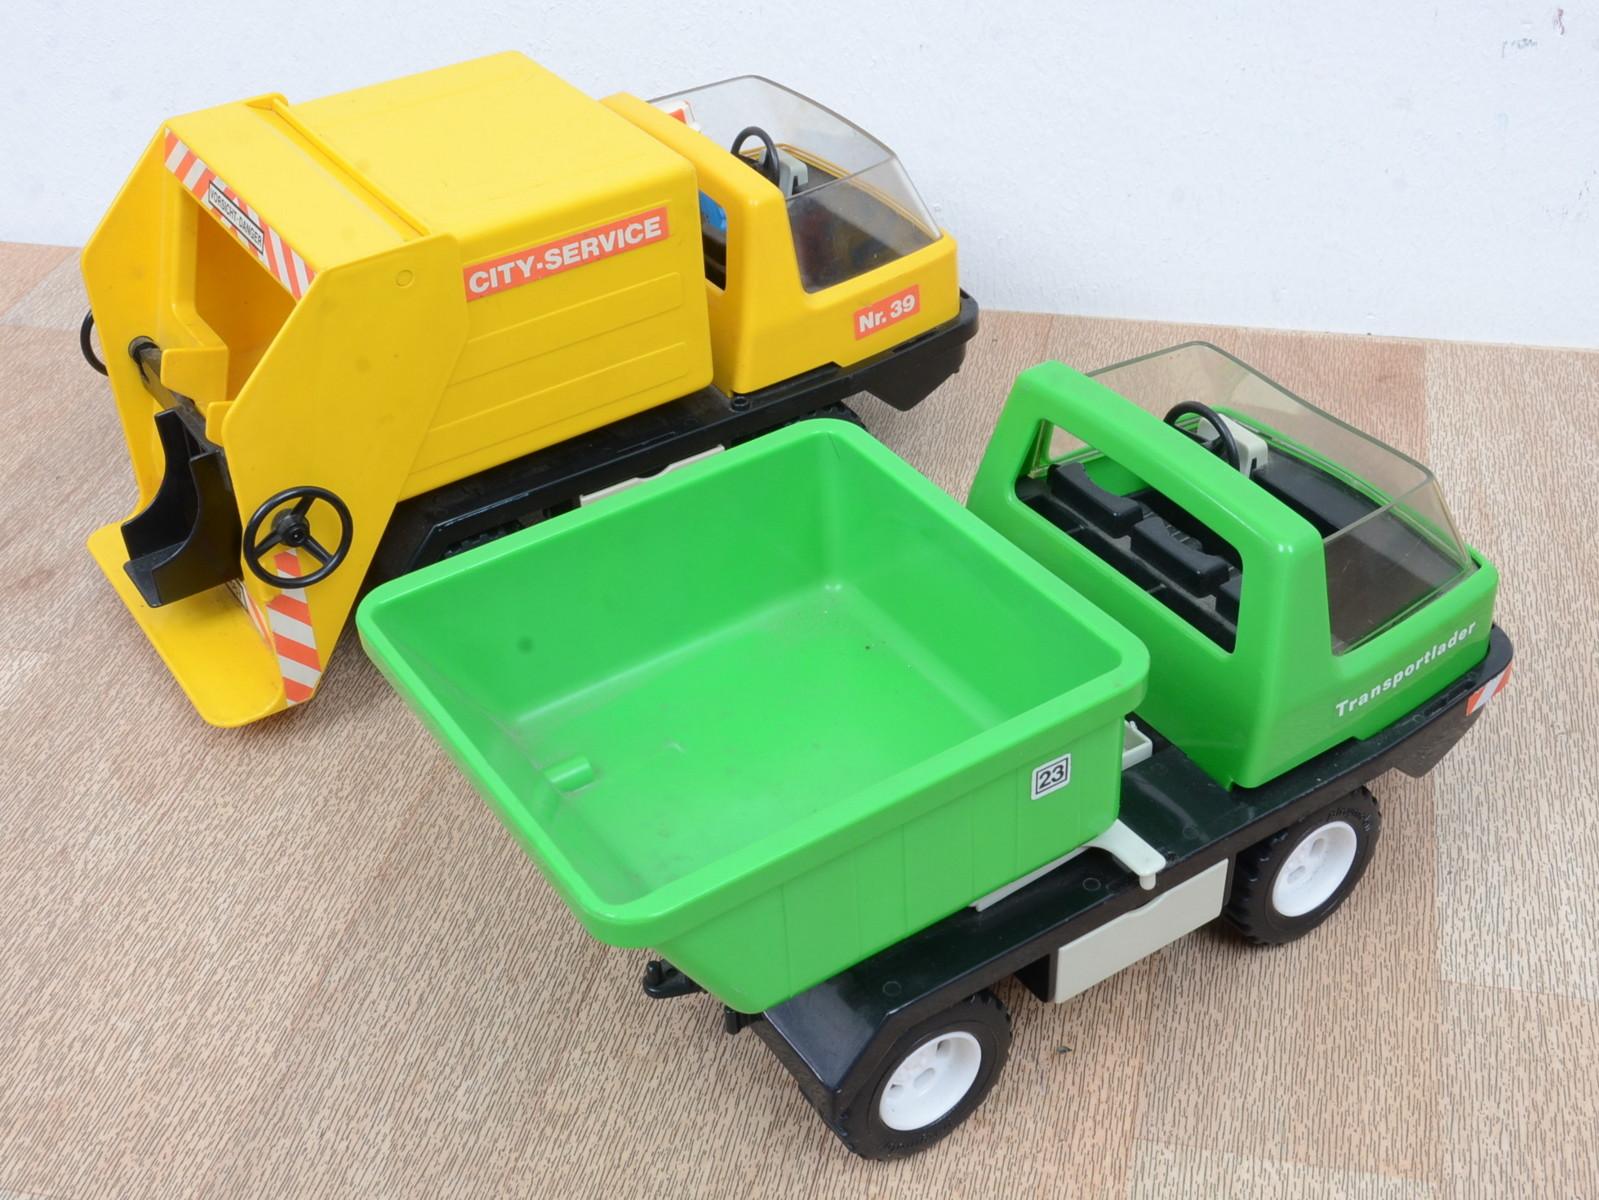 playmobil konvolut mit m llabfuhr containerwagen. Black Bedroom Furniture Sets. Home Design Ideas